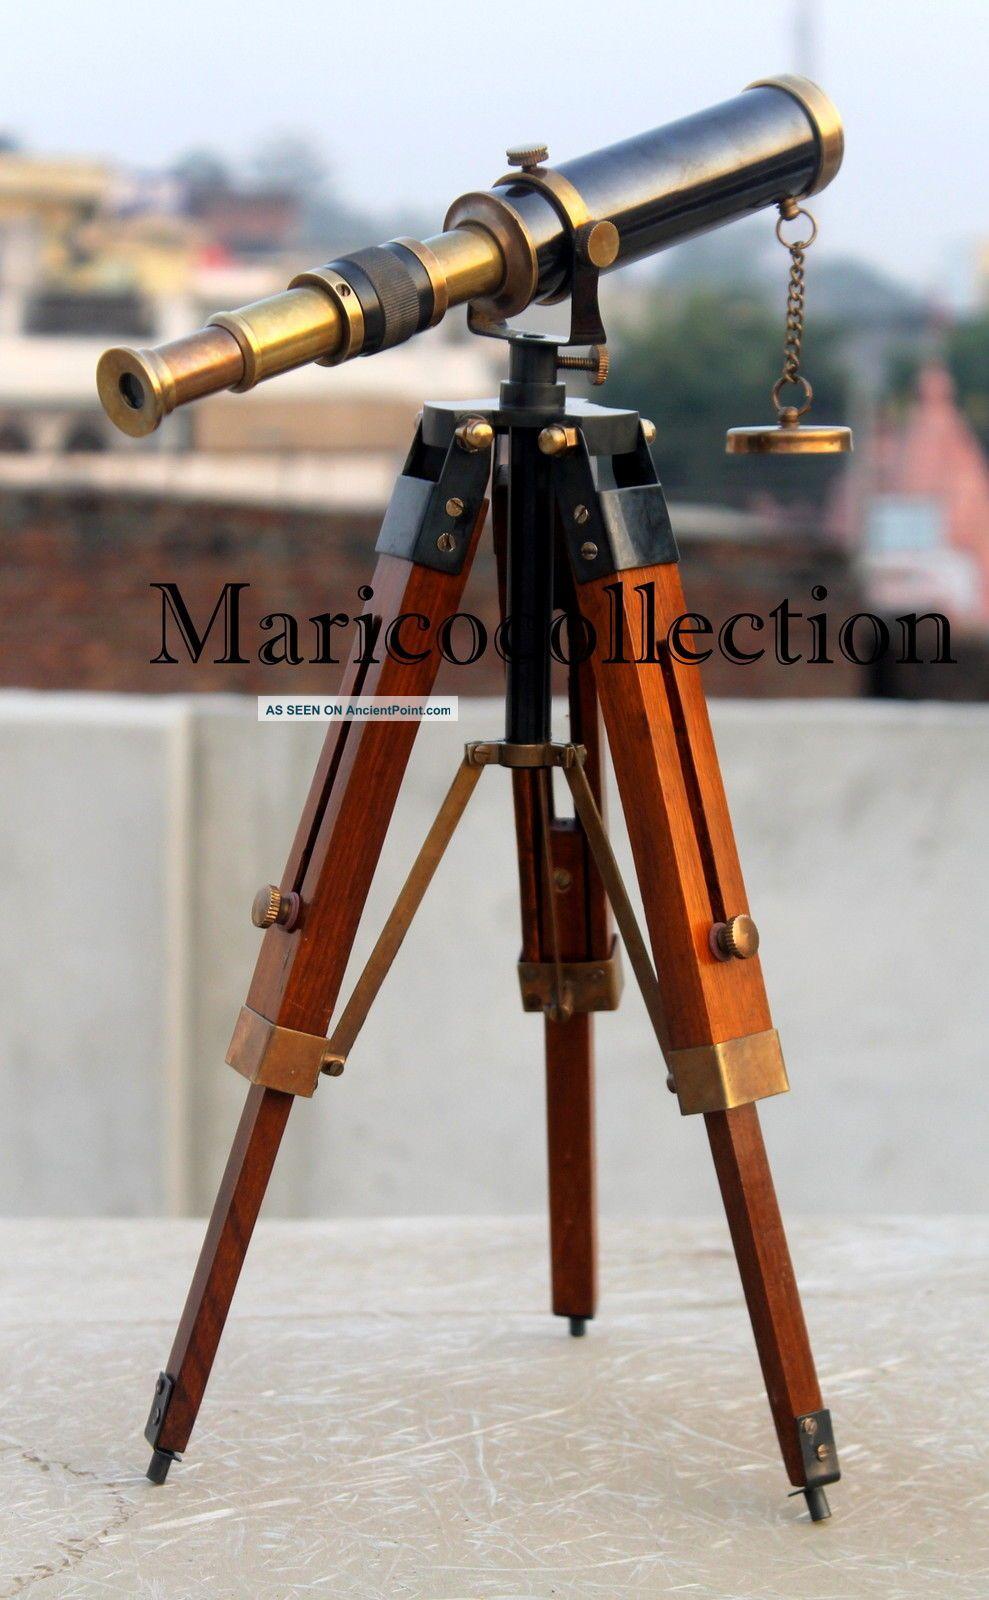 Antique Brass Telescope W/tripod Marine Pirate Spyglass Nautical Telescope Decor Telescopes photo